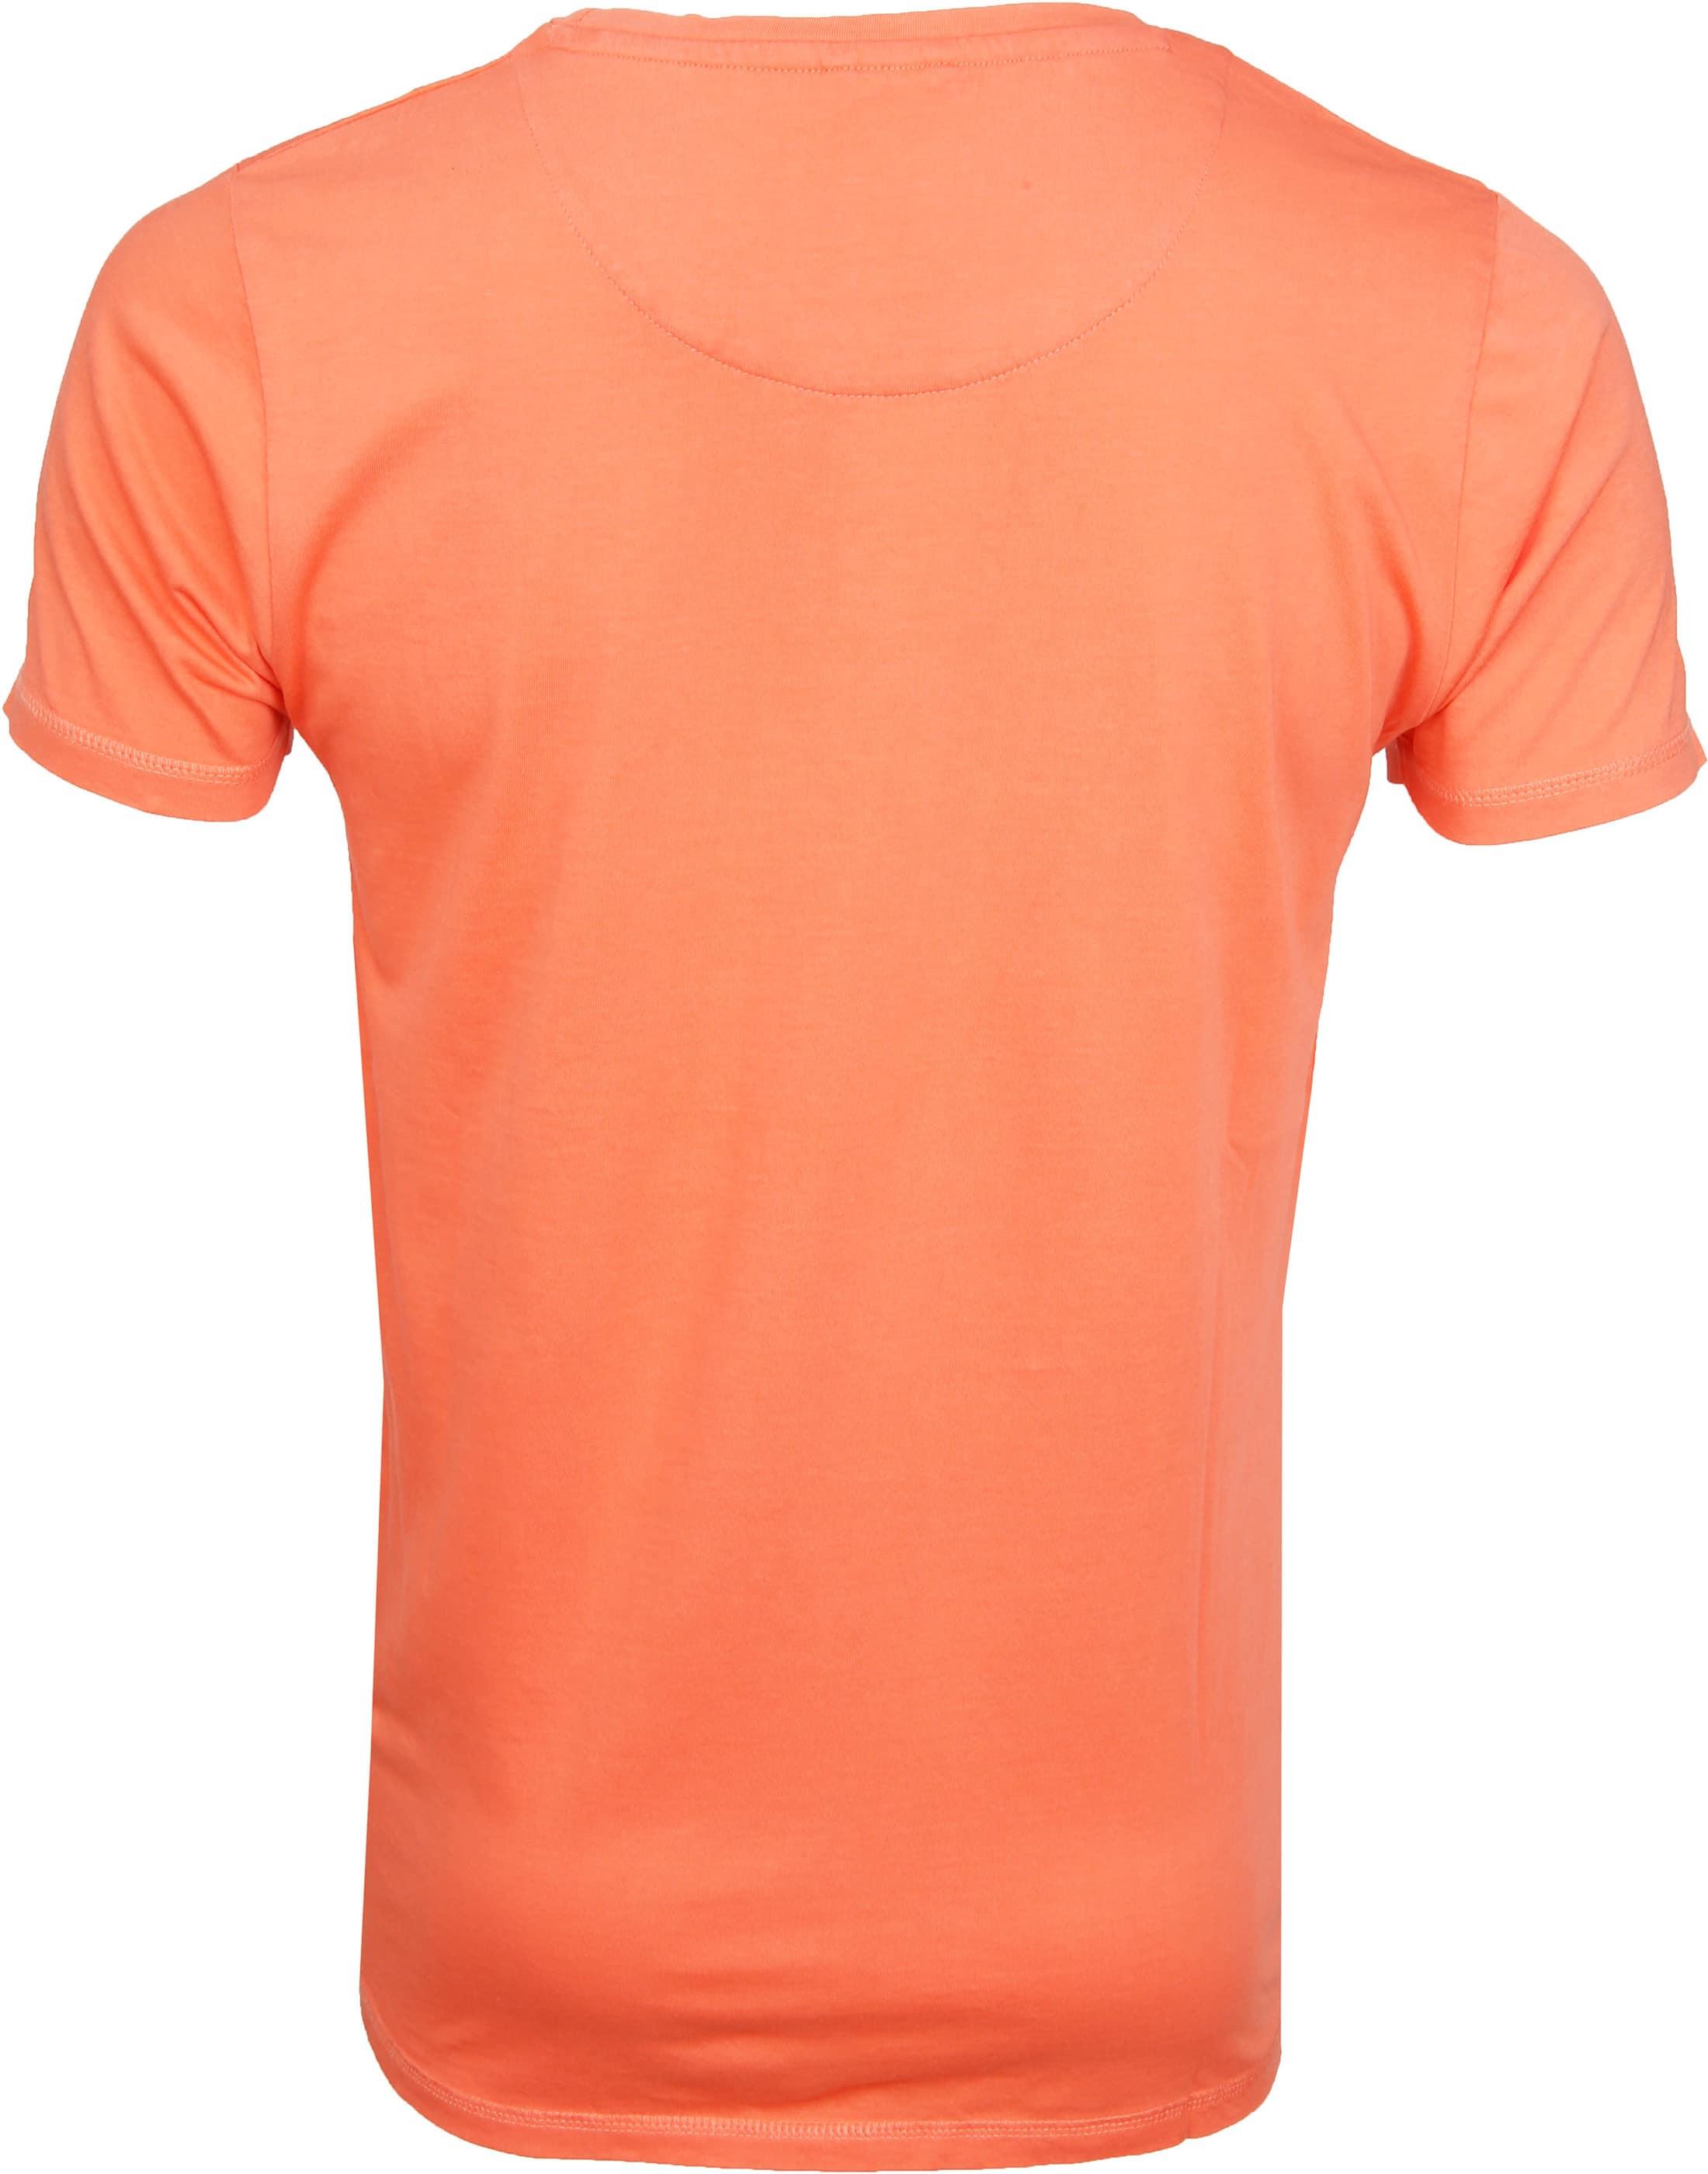 Dstrezzed T-shirt Logo Oranje foto 2